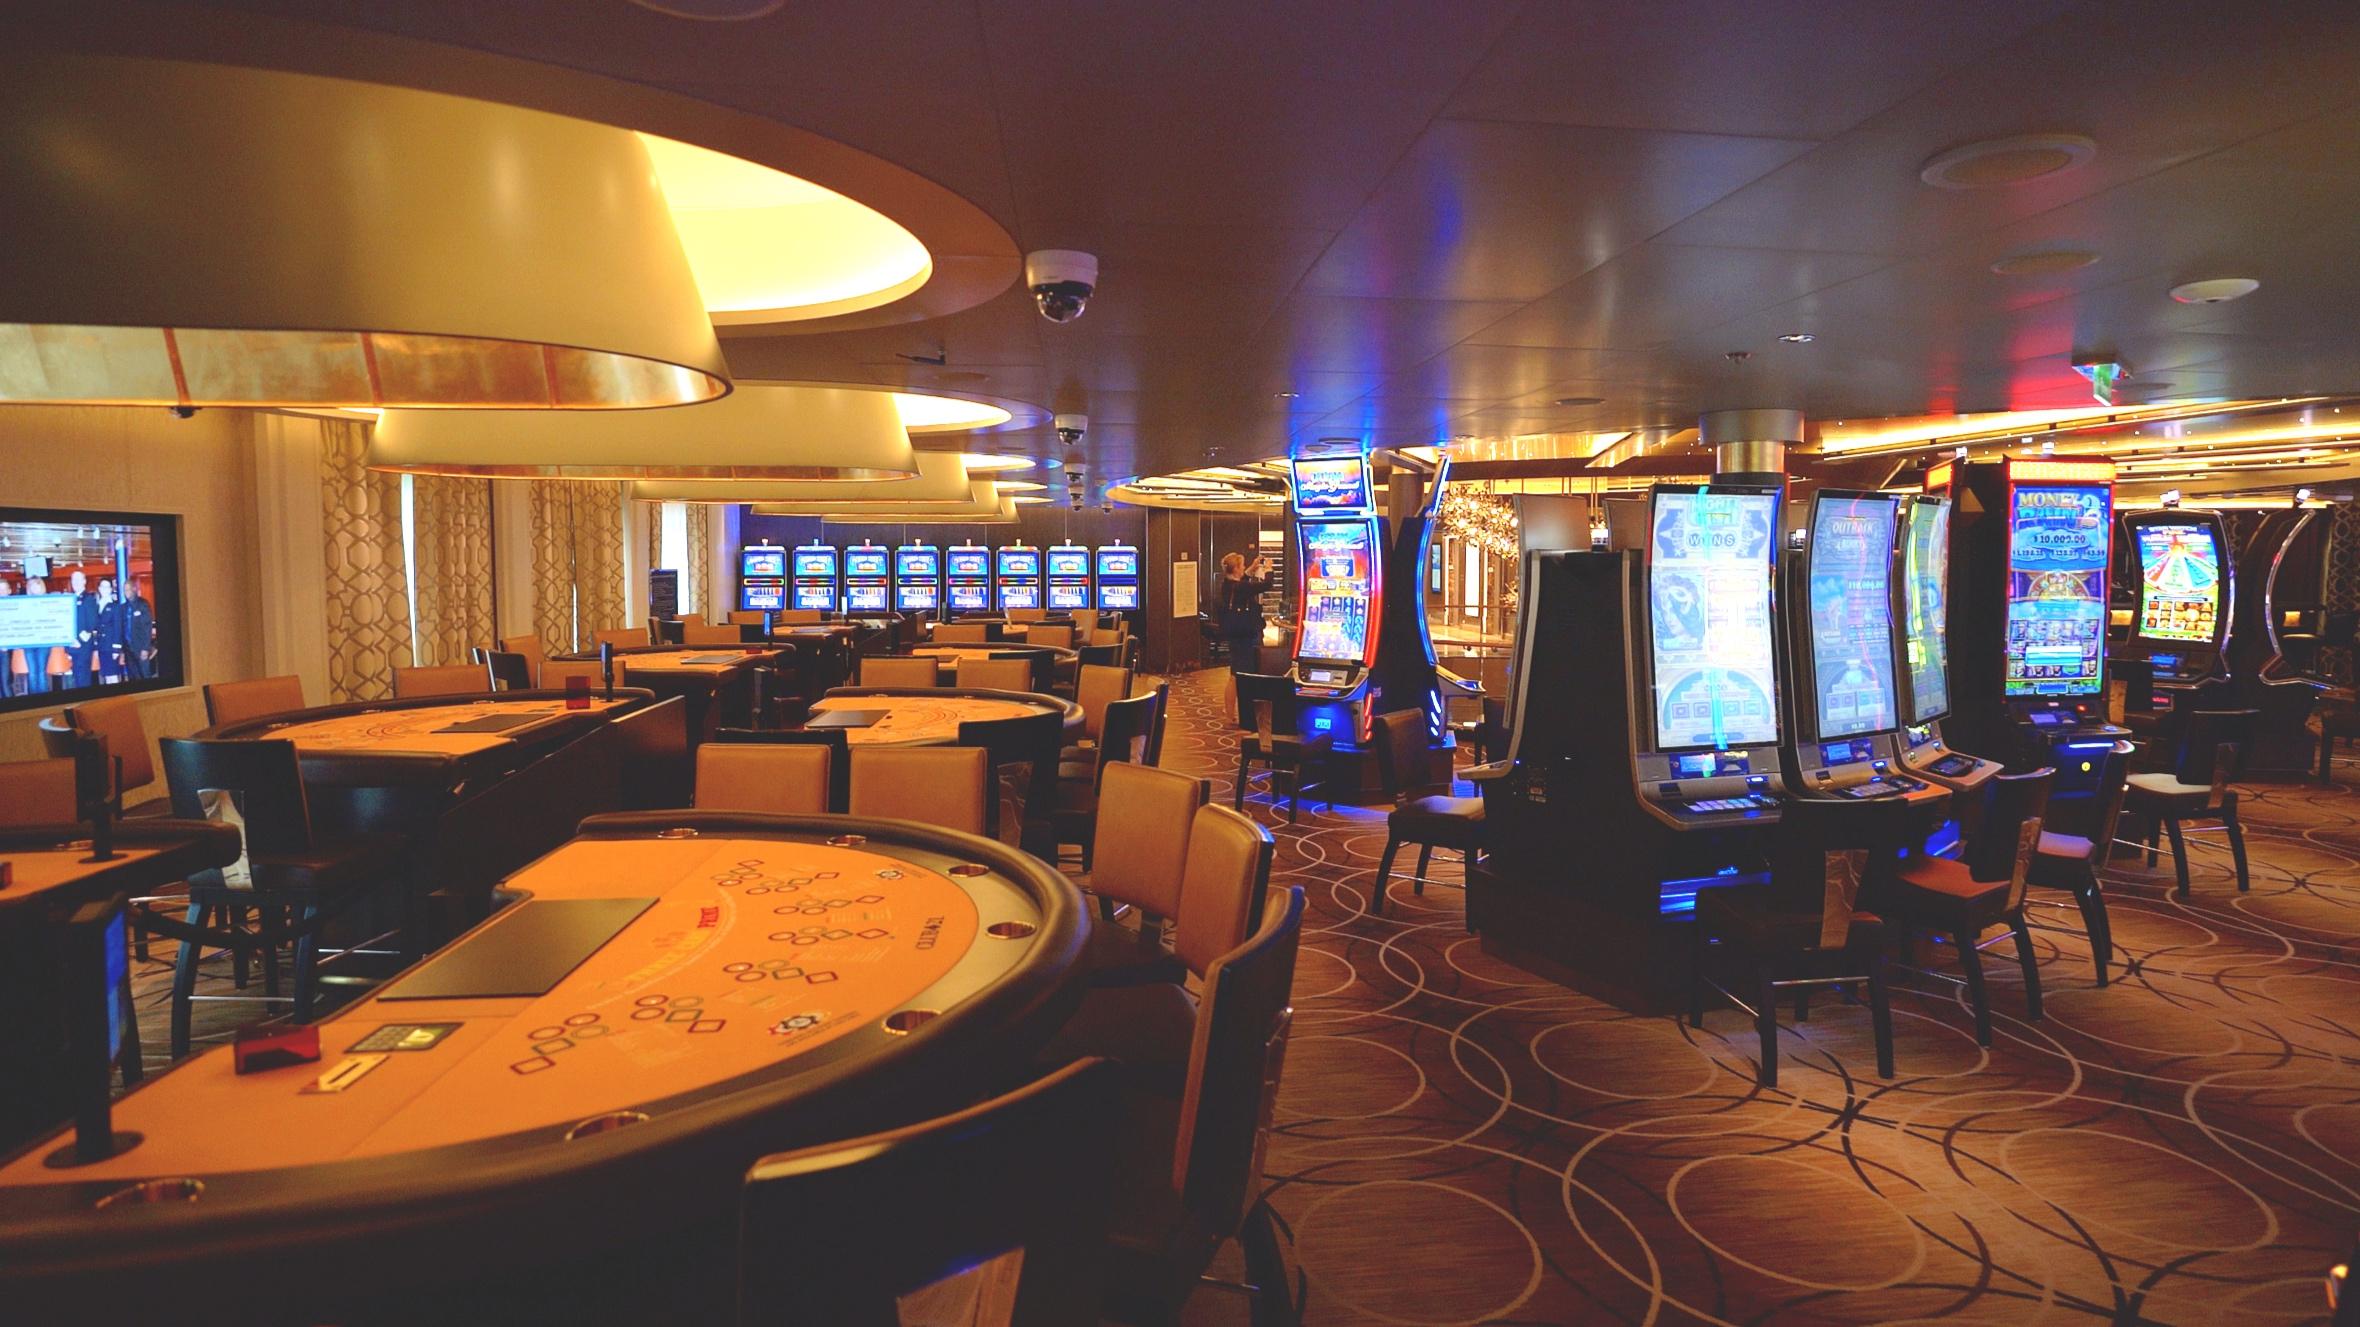 The large casino